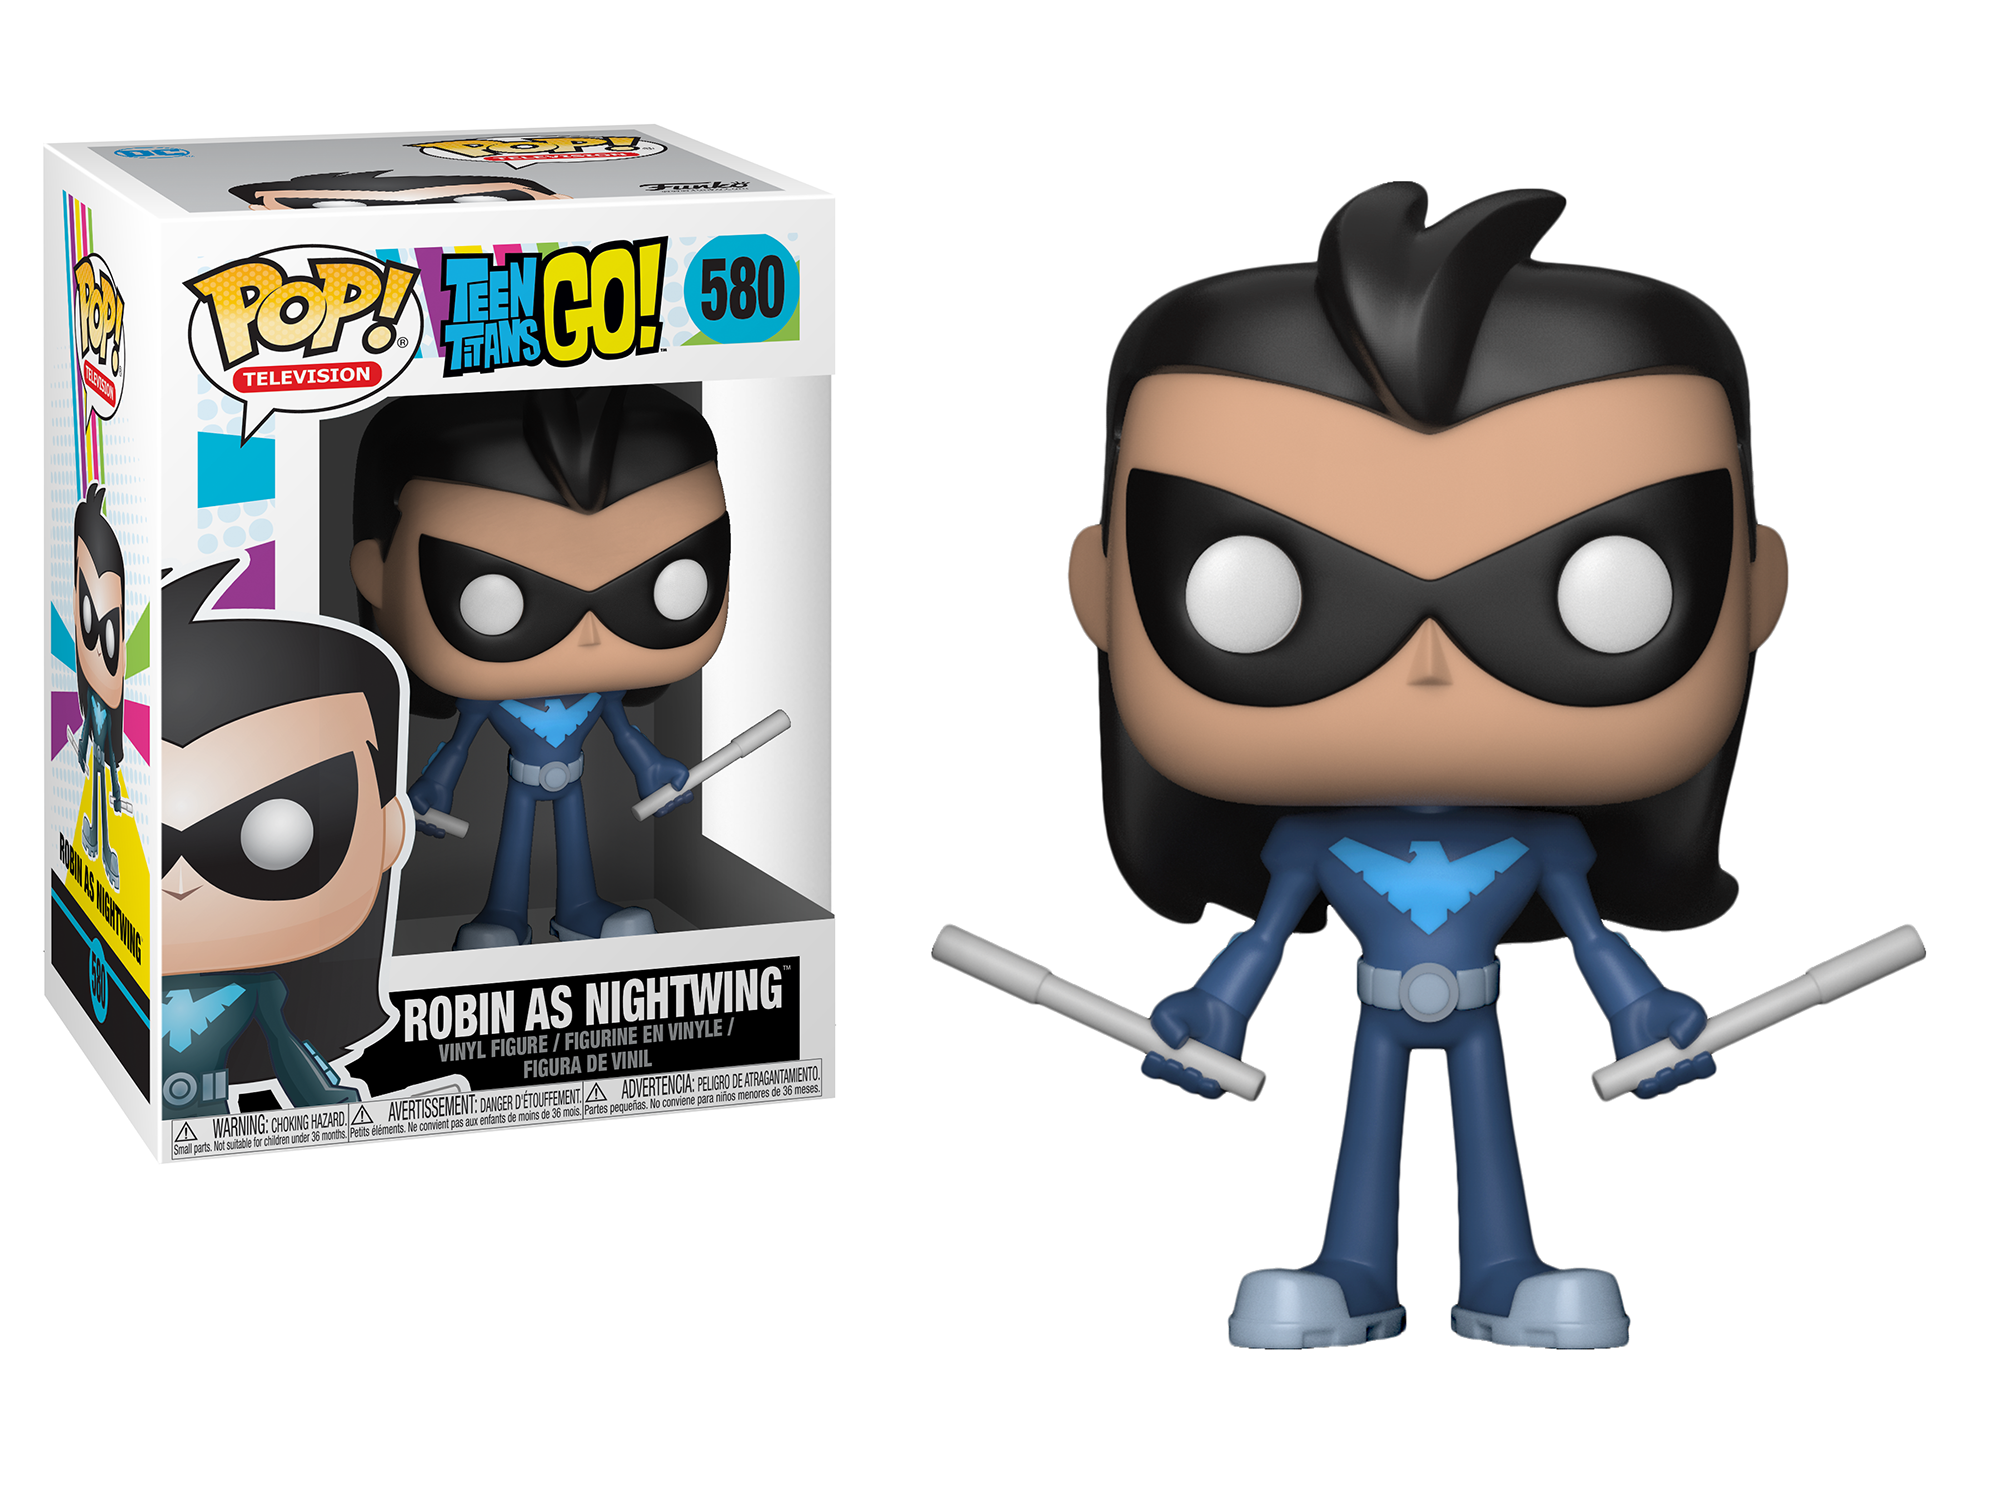 Funko Pop! Teen Titans Go - Nightwing